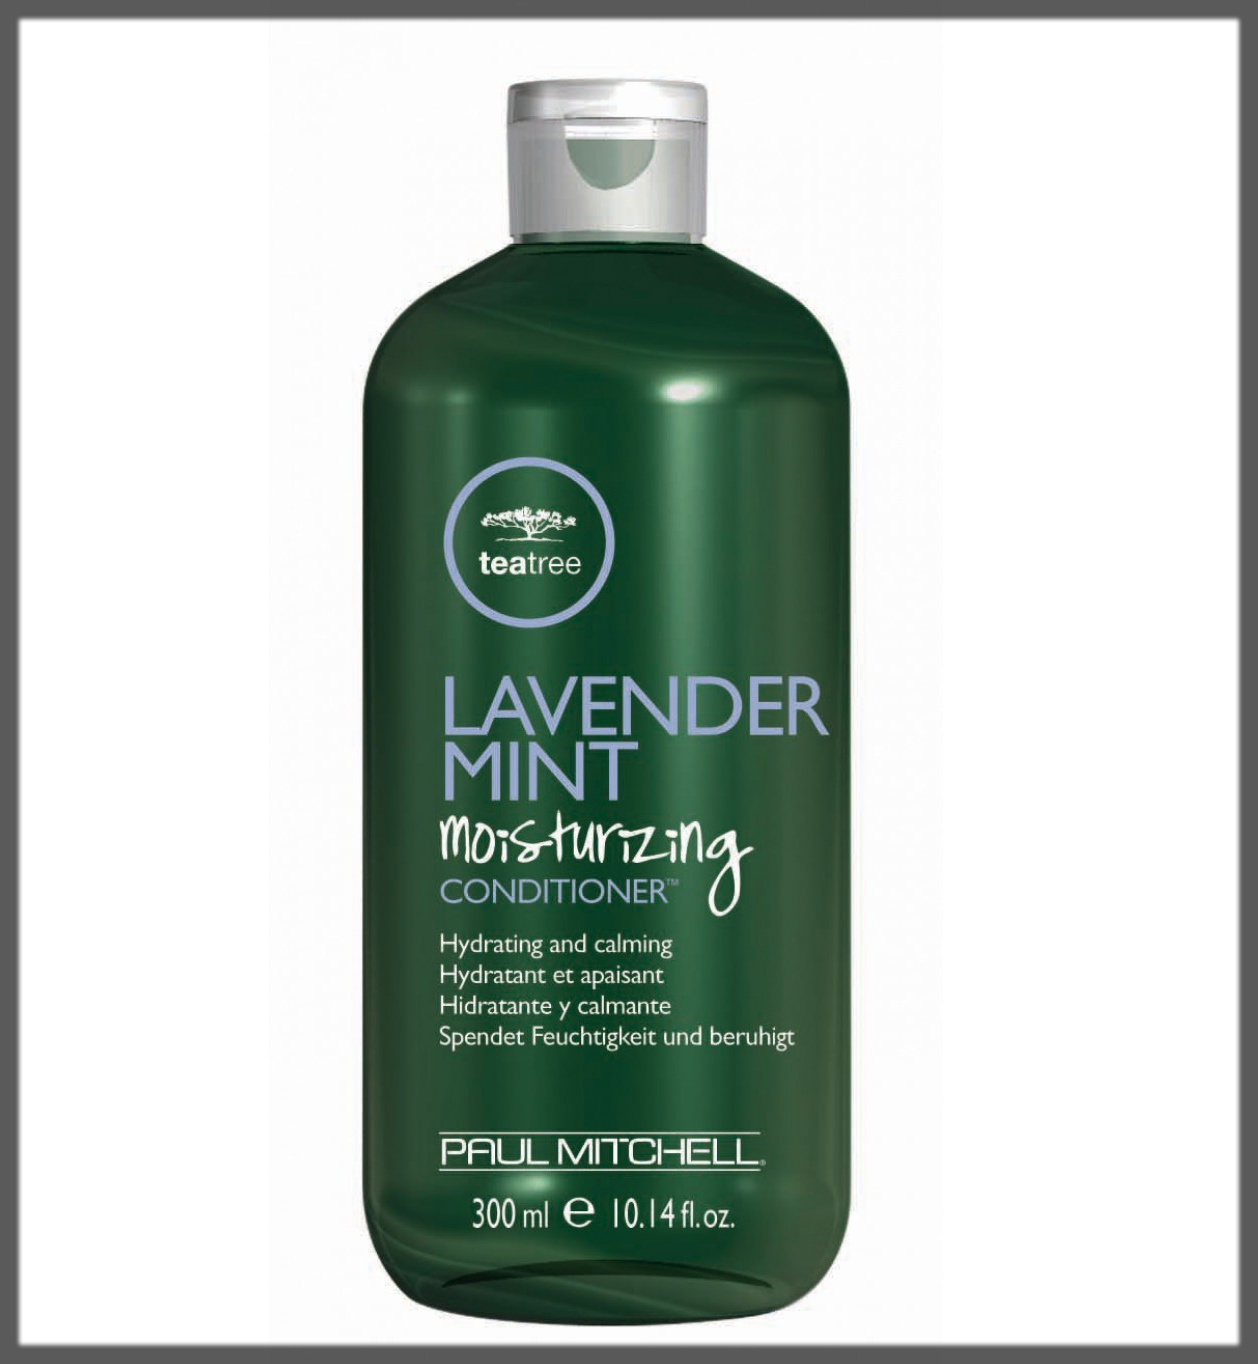 Lavender Mint Conditioner